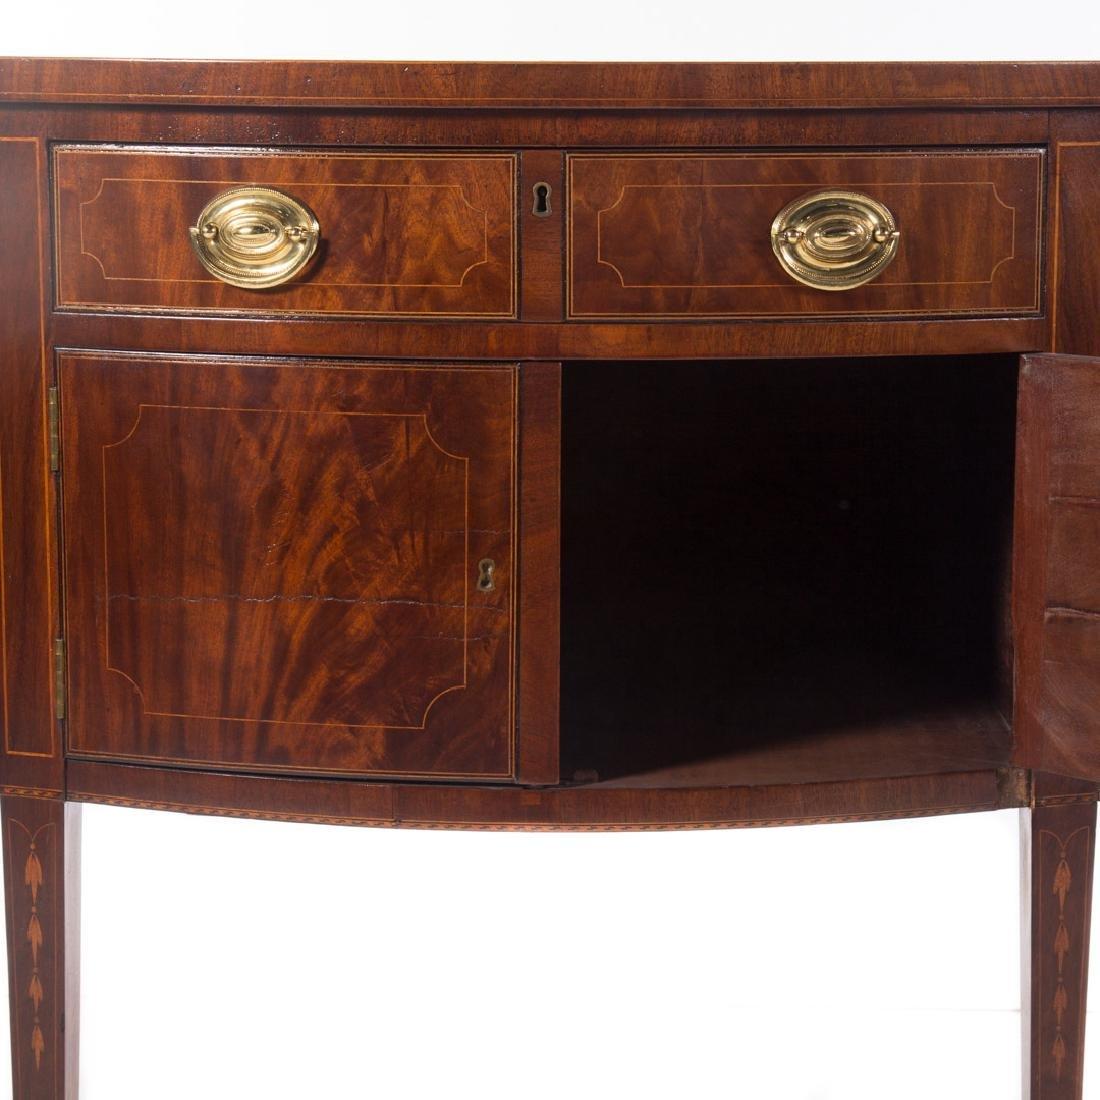 Centennial Federal style inlaid mahogany sideboard - 3